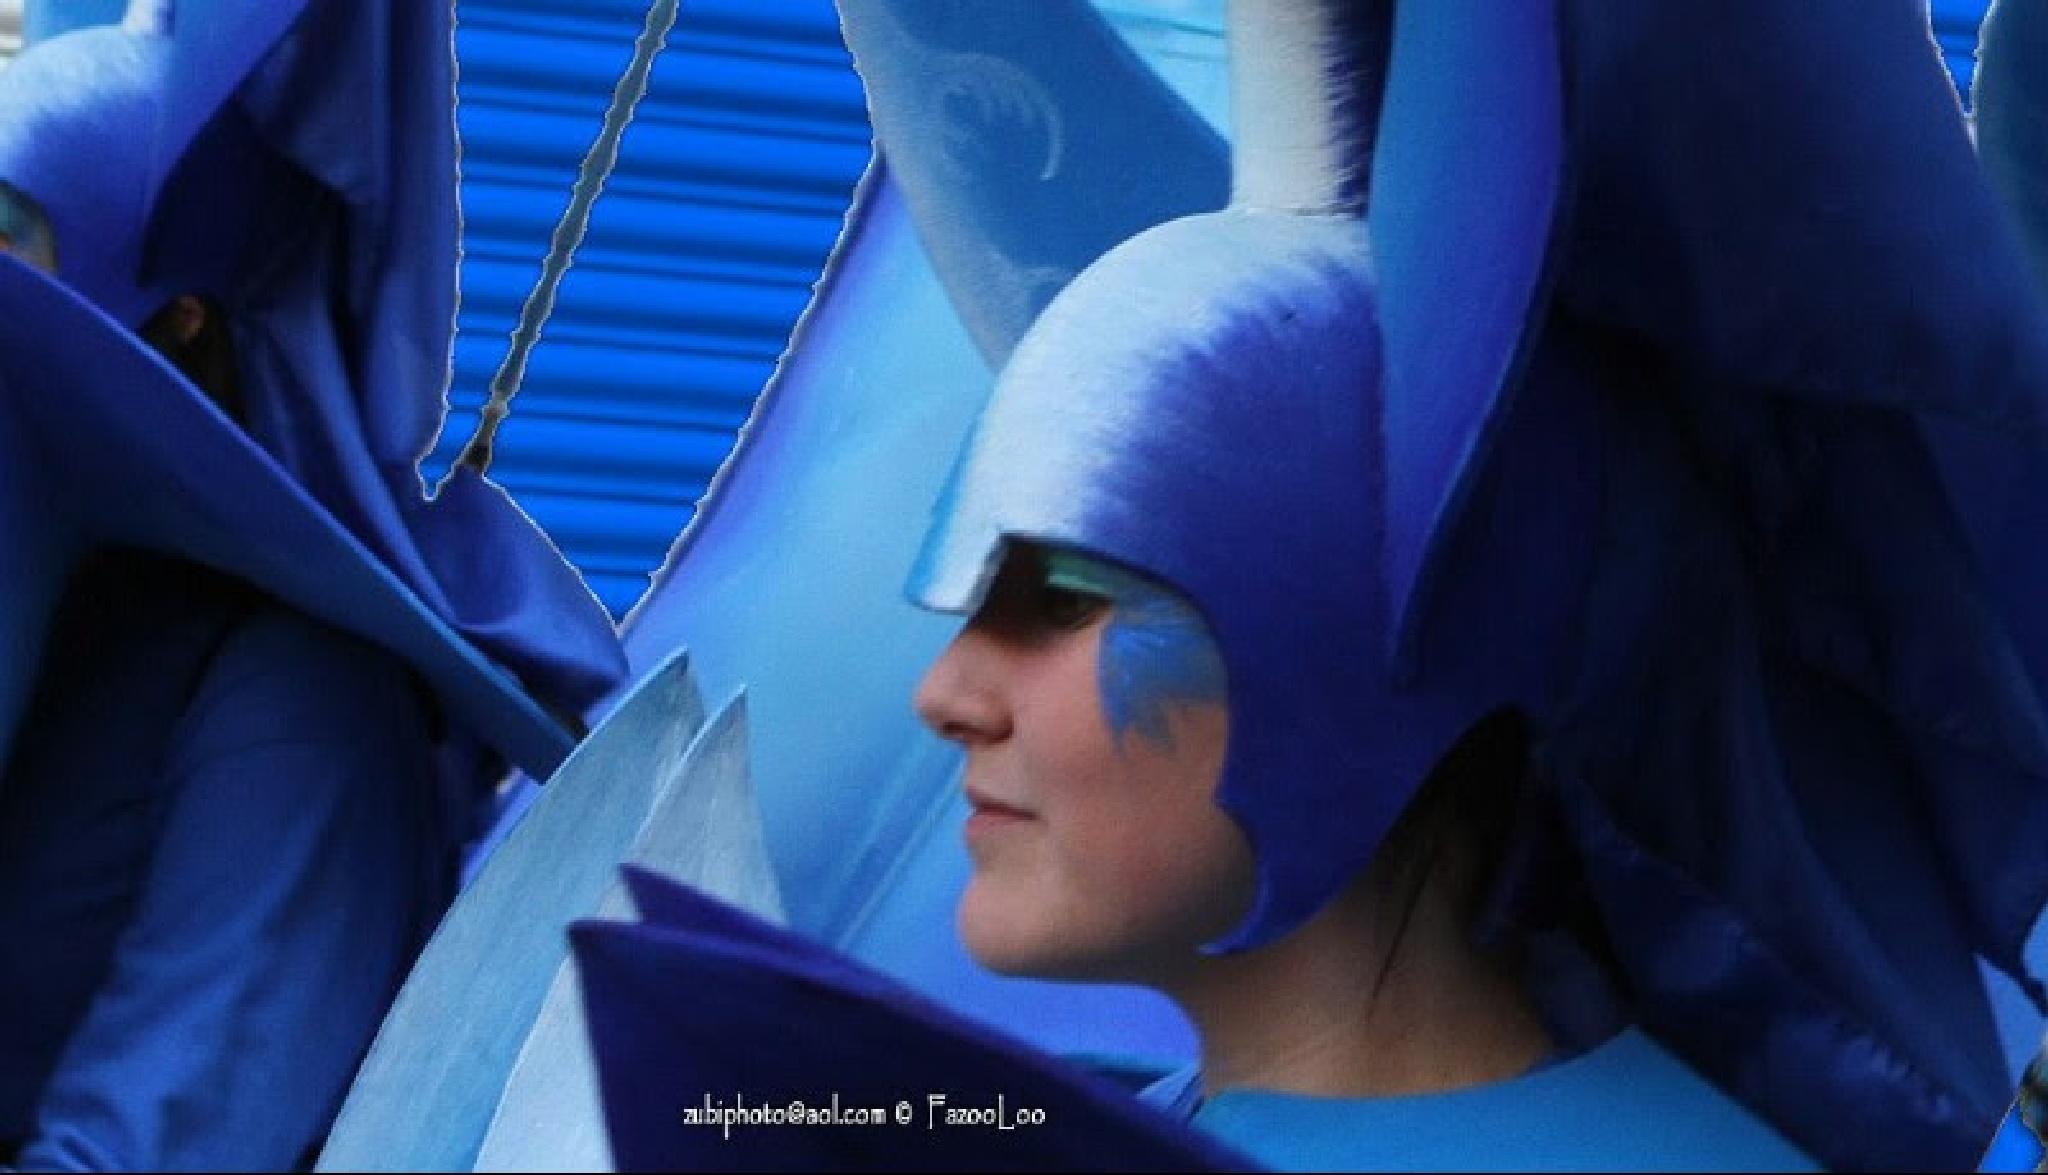 Cool Blue by fazooloo